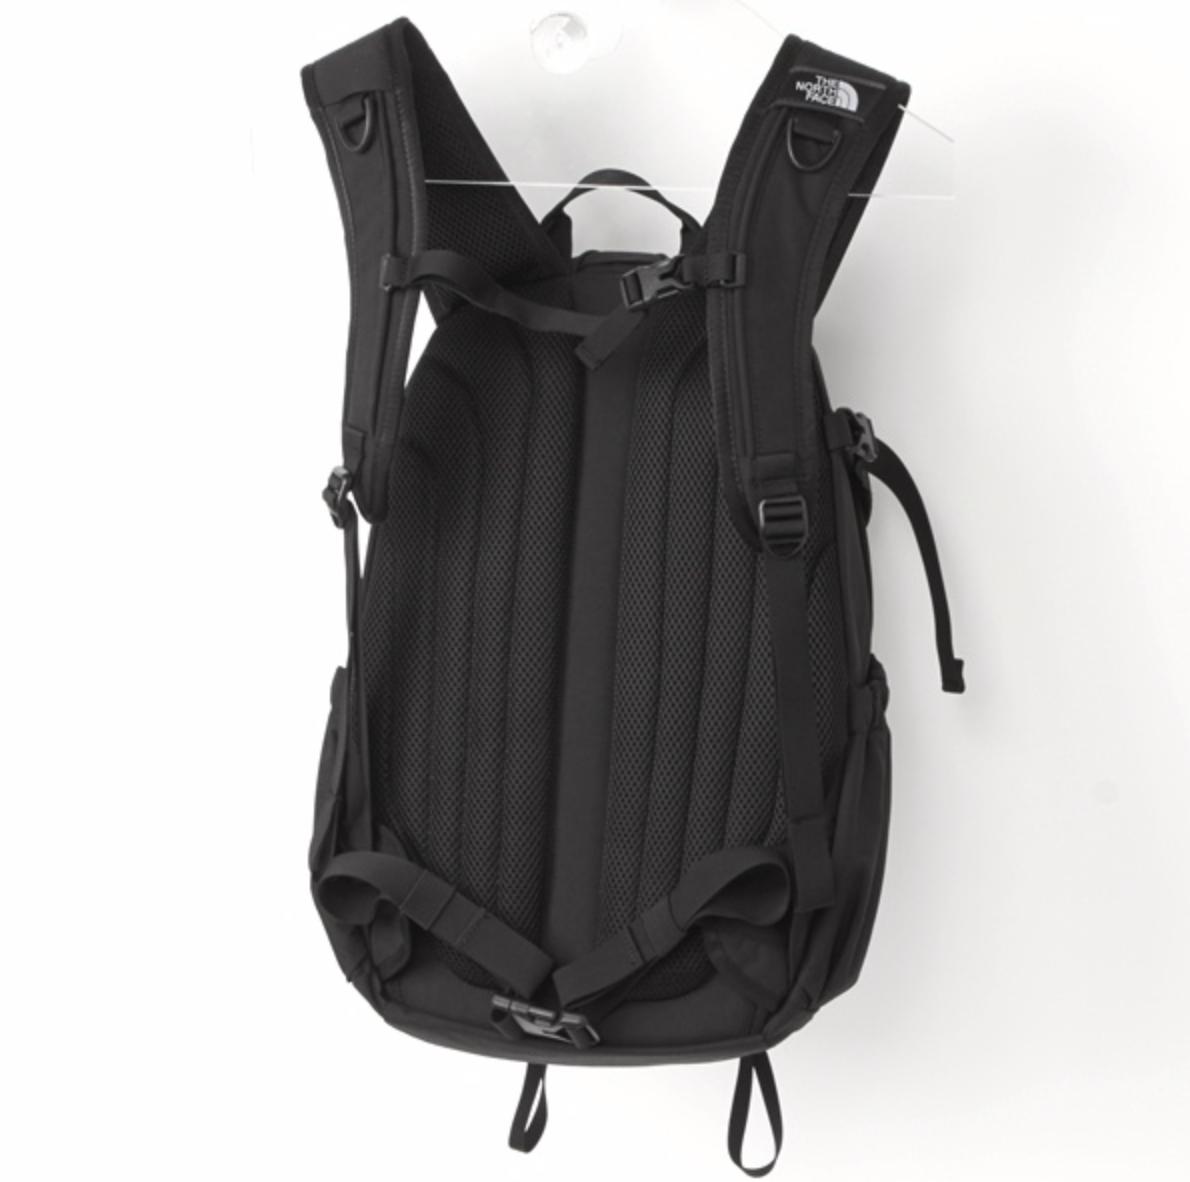 f:id:thebackpack:20190406090752p:plain